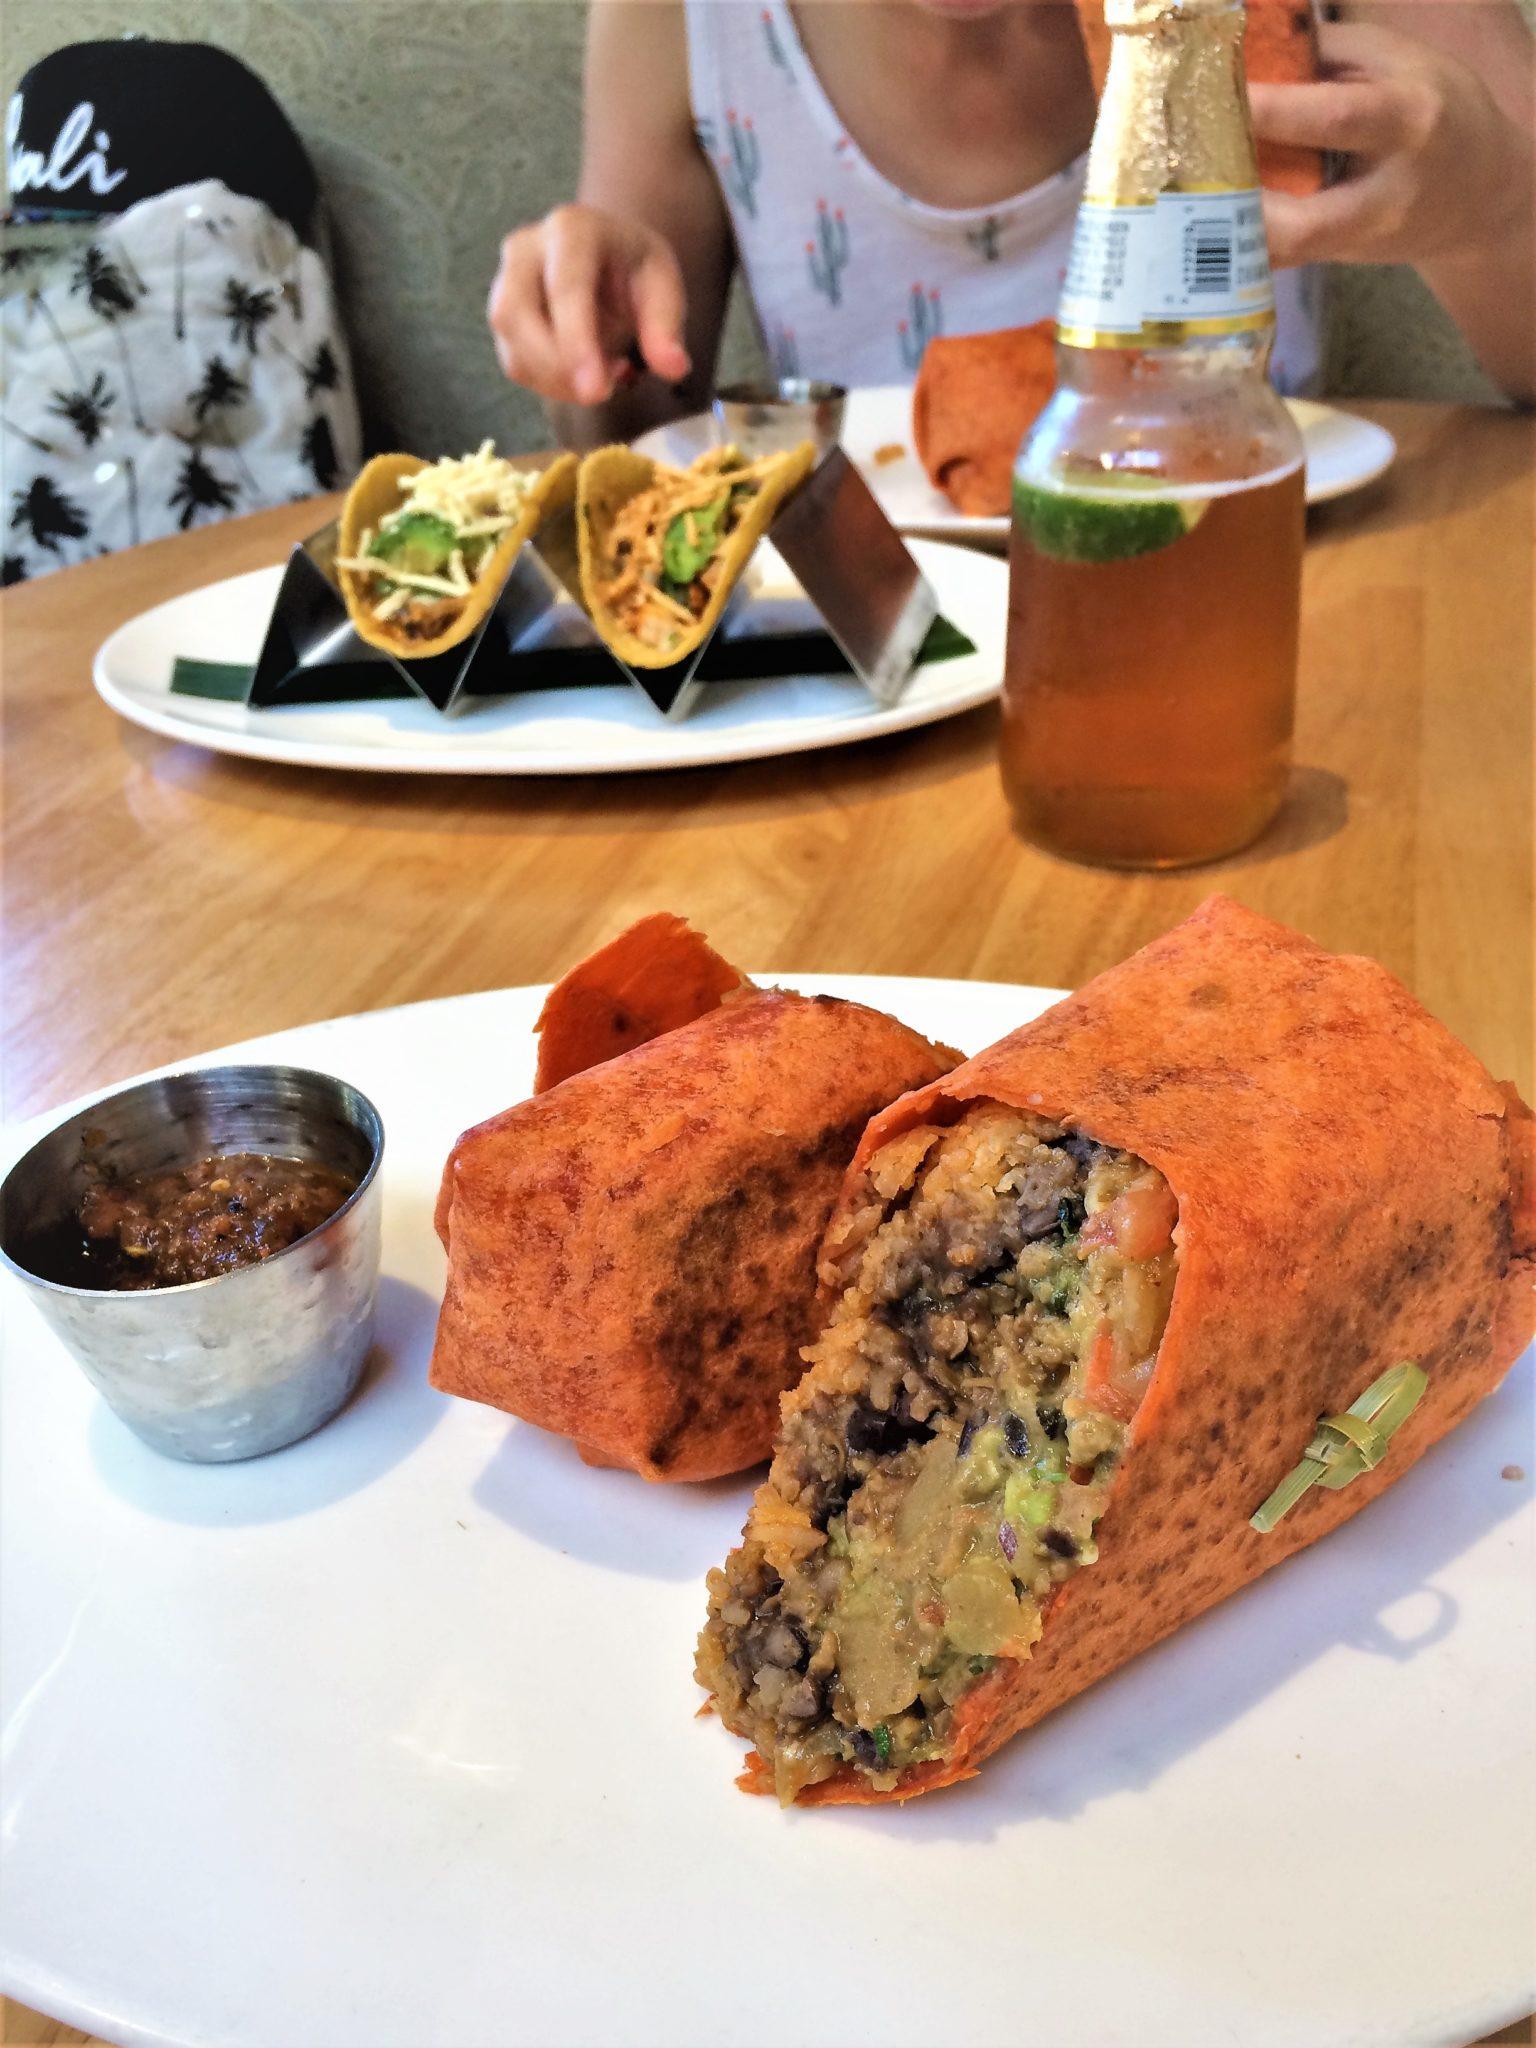 Vegan restaurants Los Angeles, Tocaya Organica, California, burrito